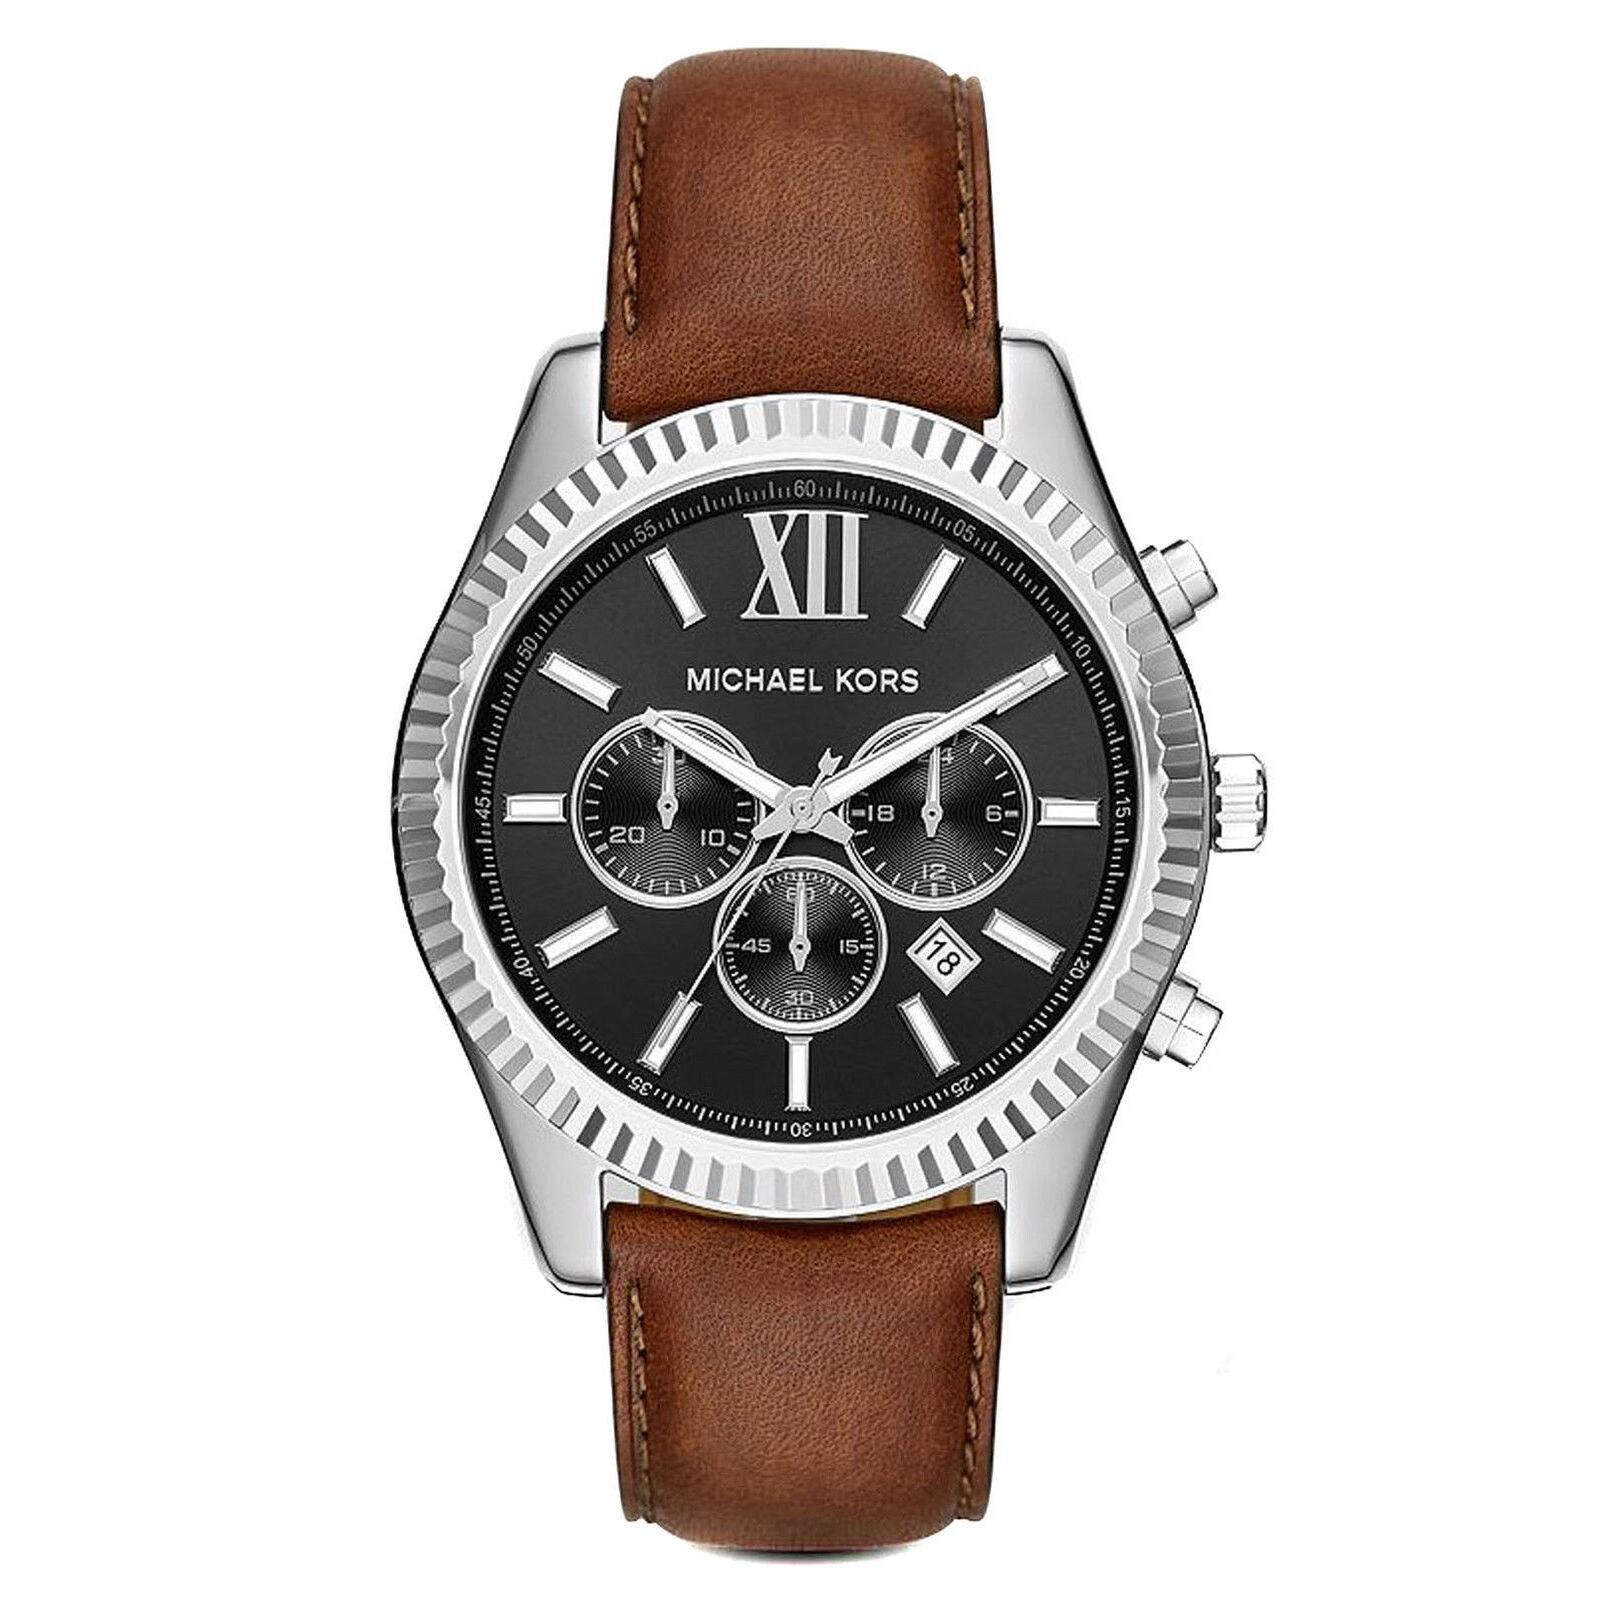 Michael Kors Mens MK8456 Lexington Chronograph Black Dial Brown Leather Watch MK8456